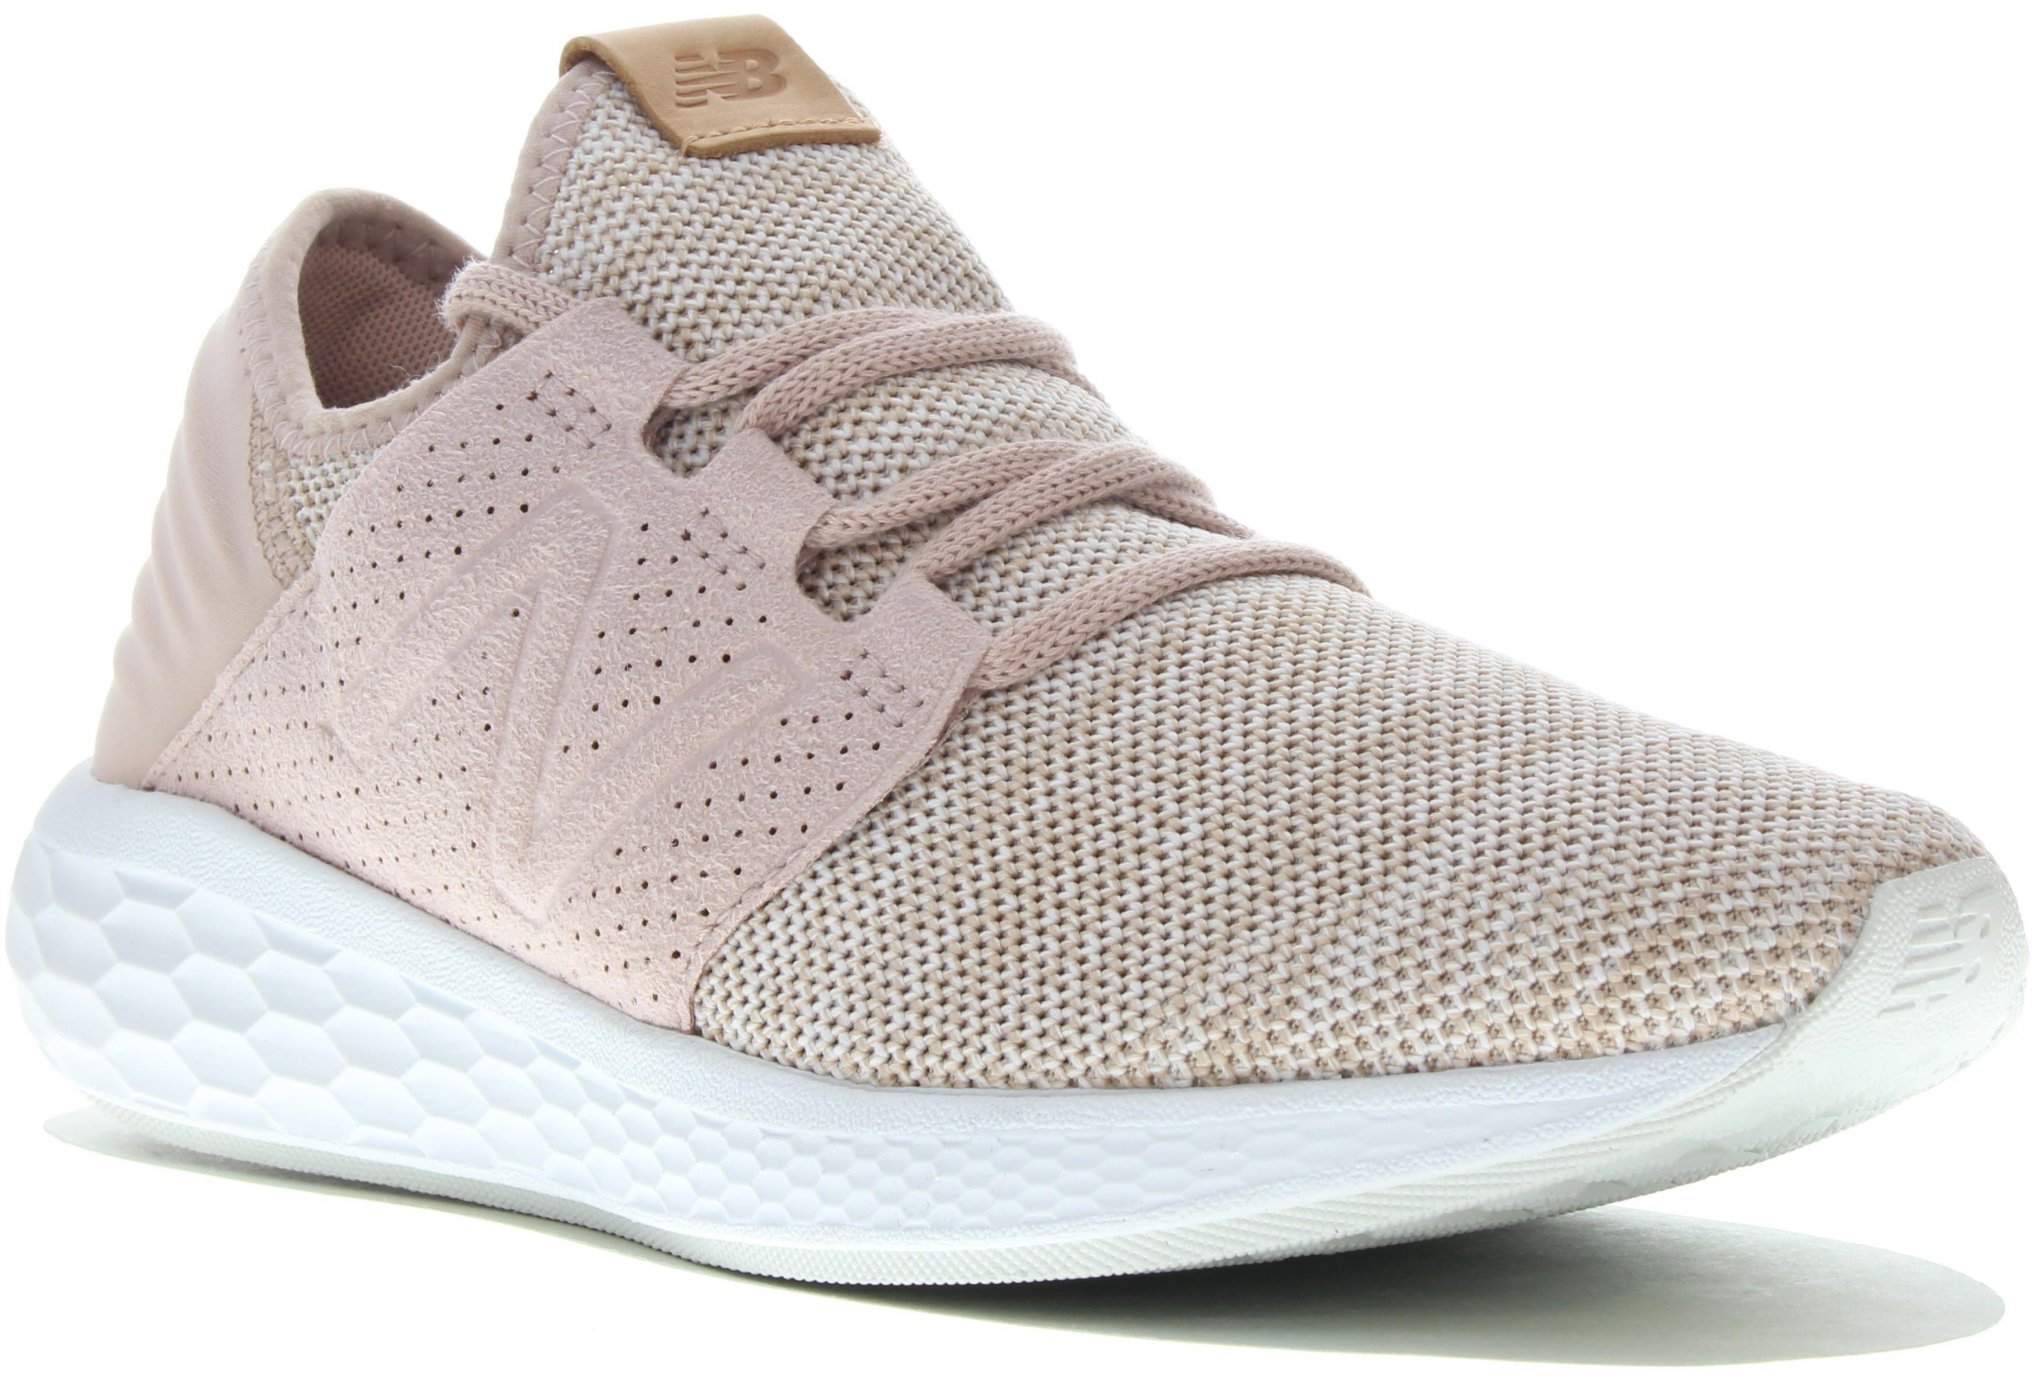 New Balance Fresh Foam Cruz v2 Knit W Chaussures running femme